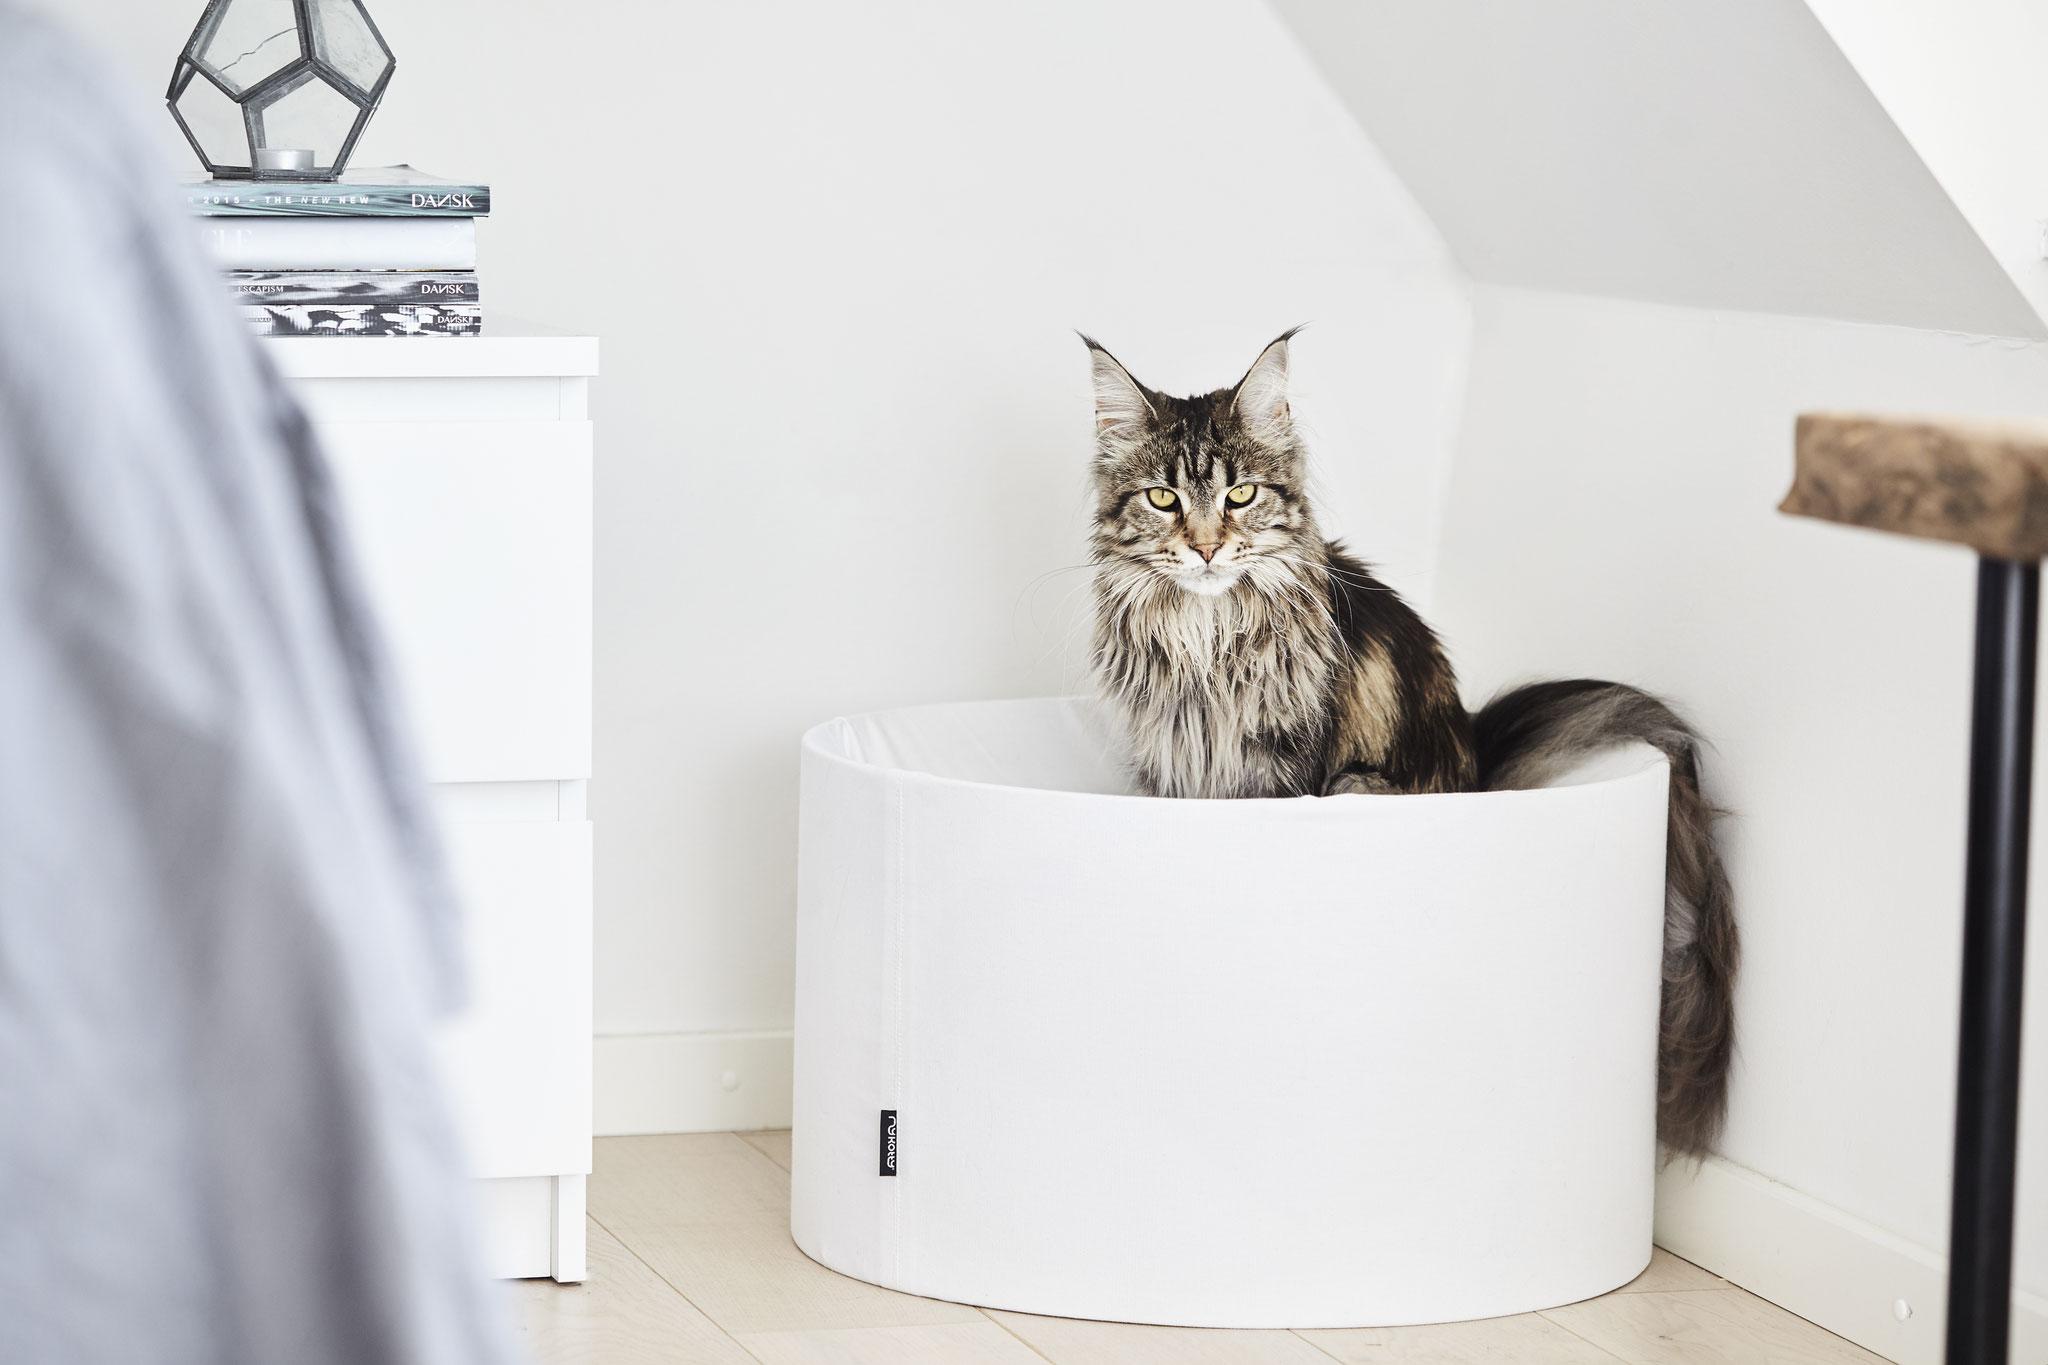 modernes design katzenm bel von mykotty design for cats. Black Bedroom Furniture Sets. Home Design Ideas